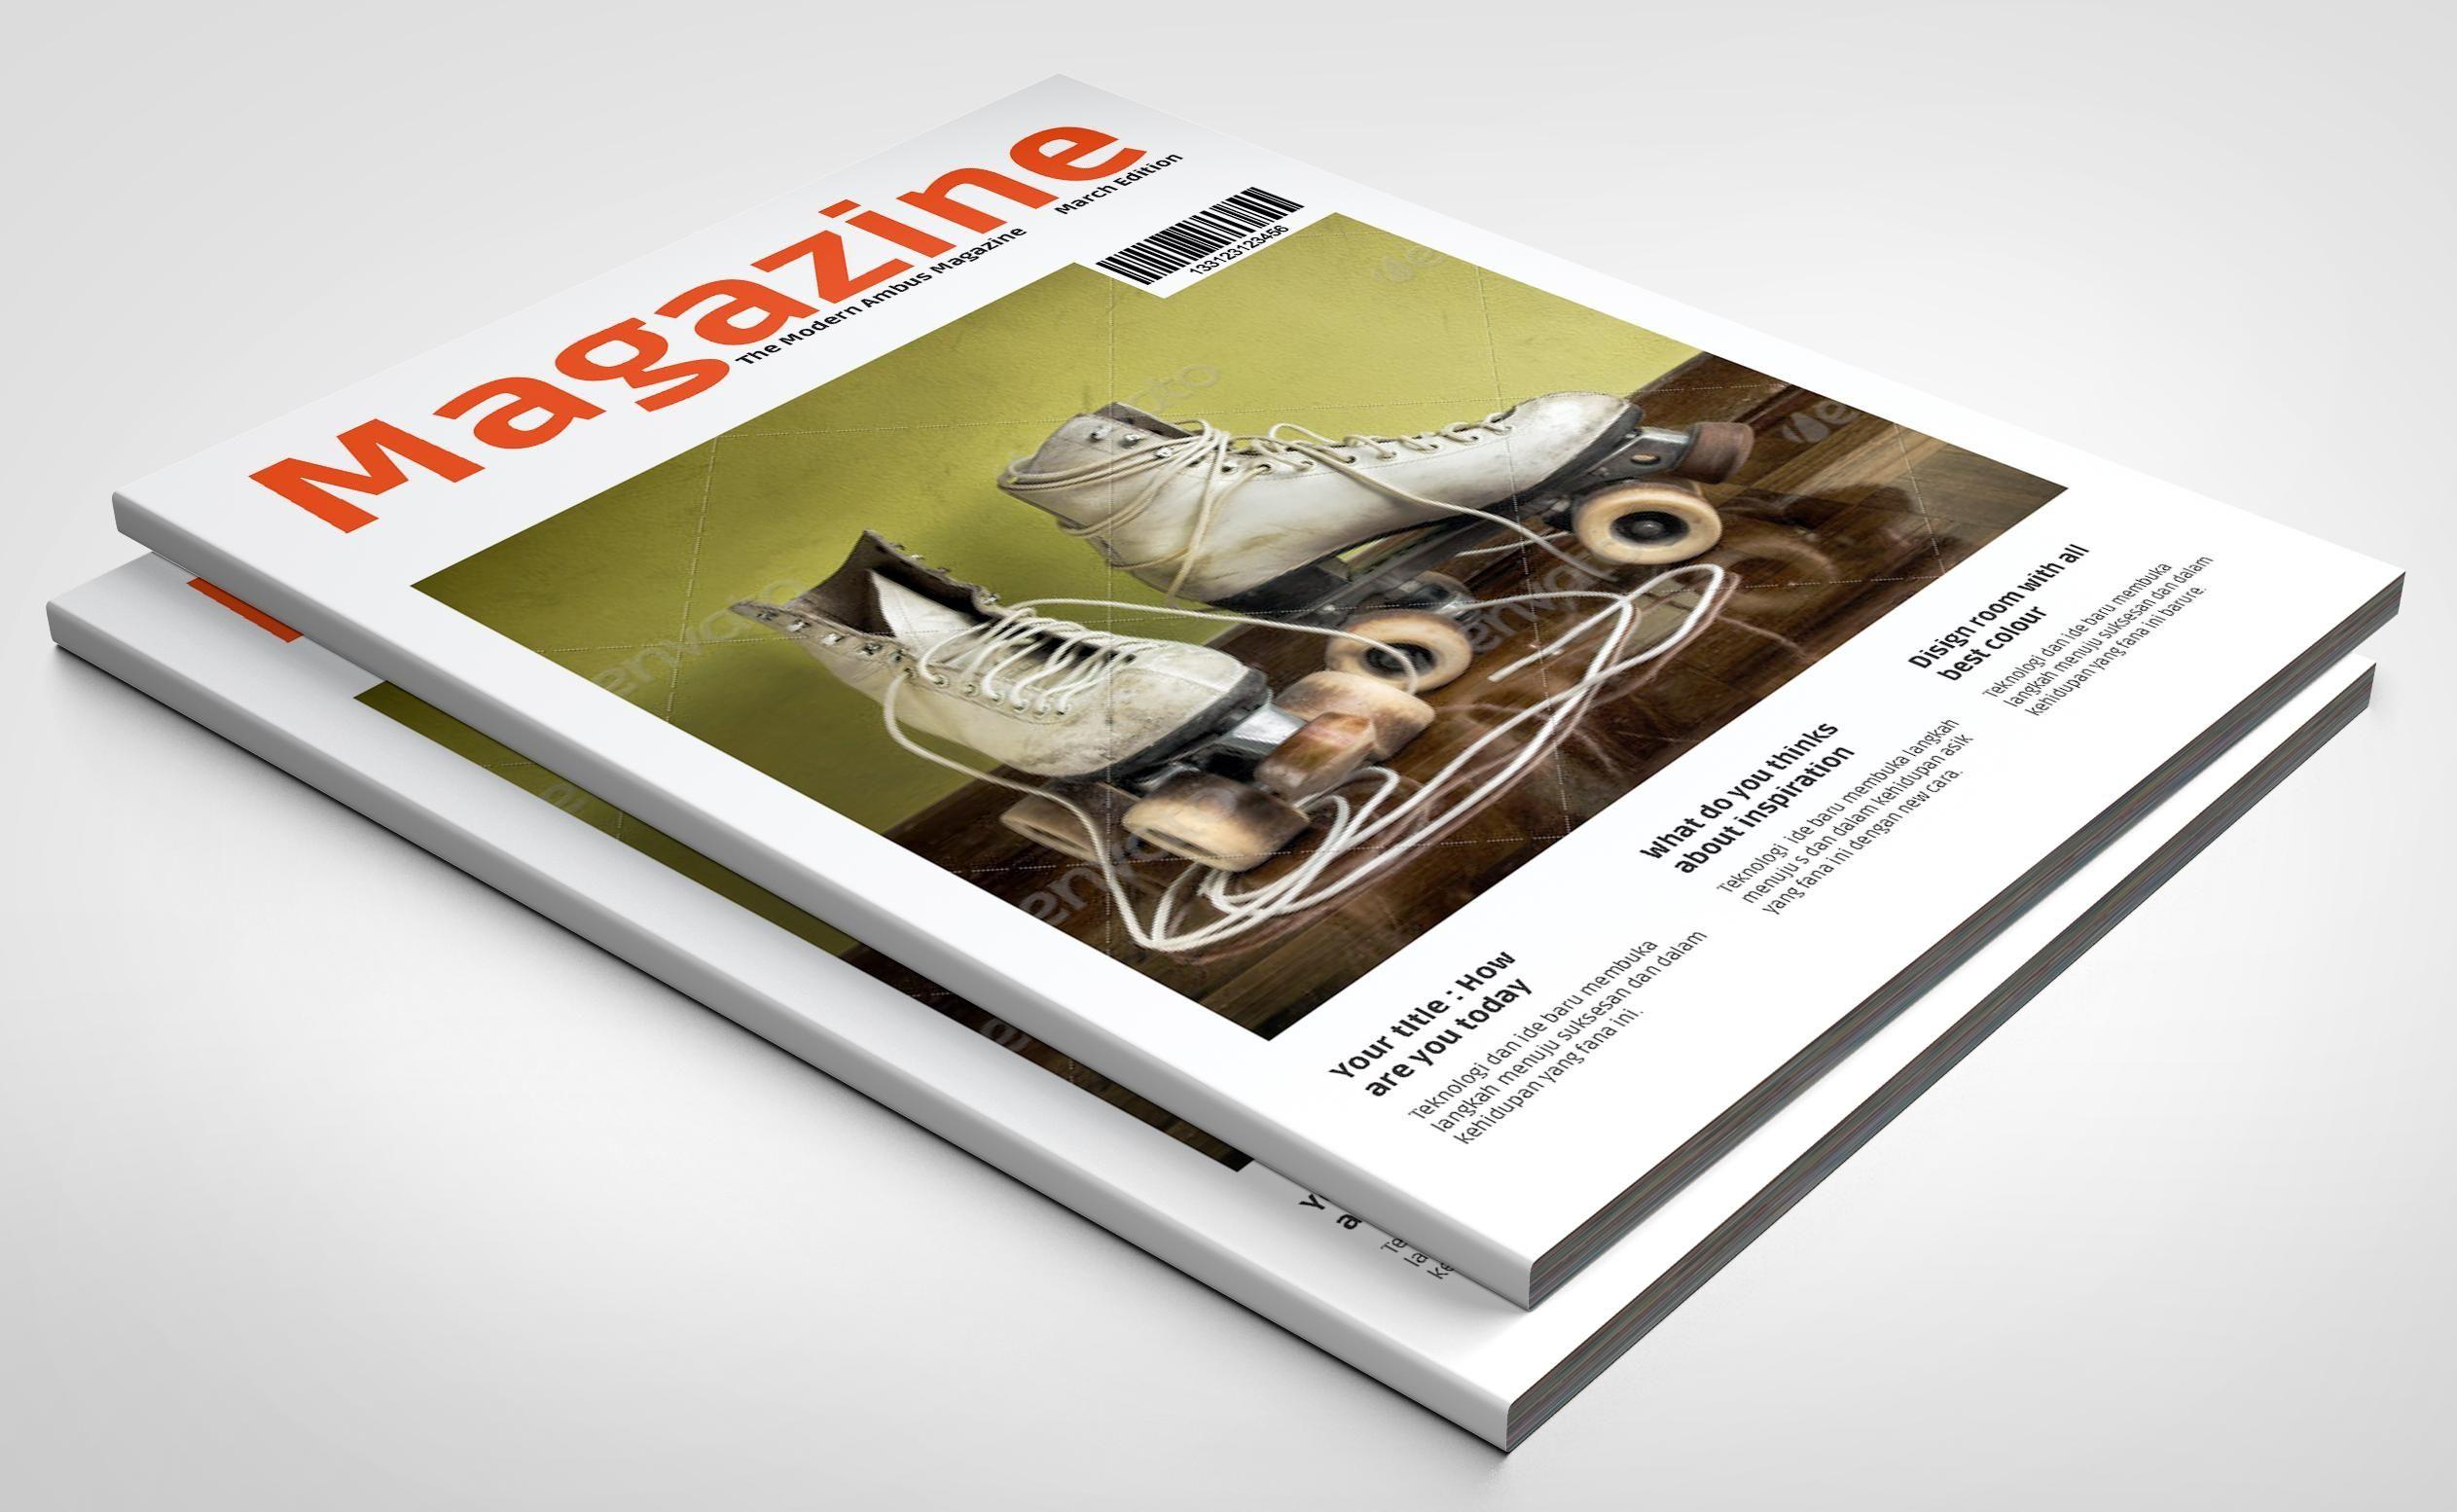 magazine dream meaning, dream about magazine, magazine dream interpretation, seeing in a dream magazine